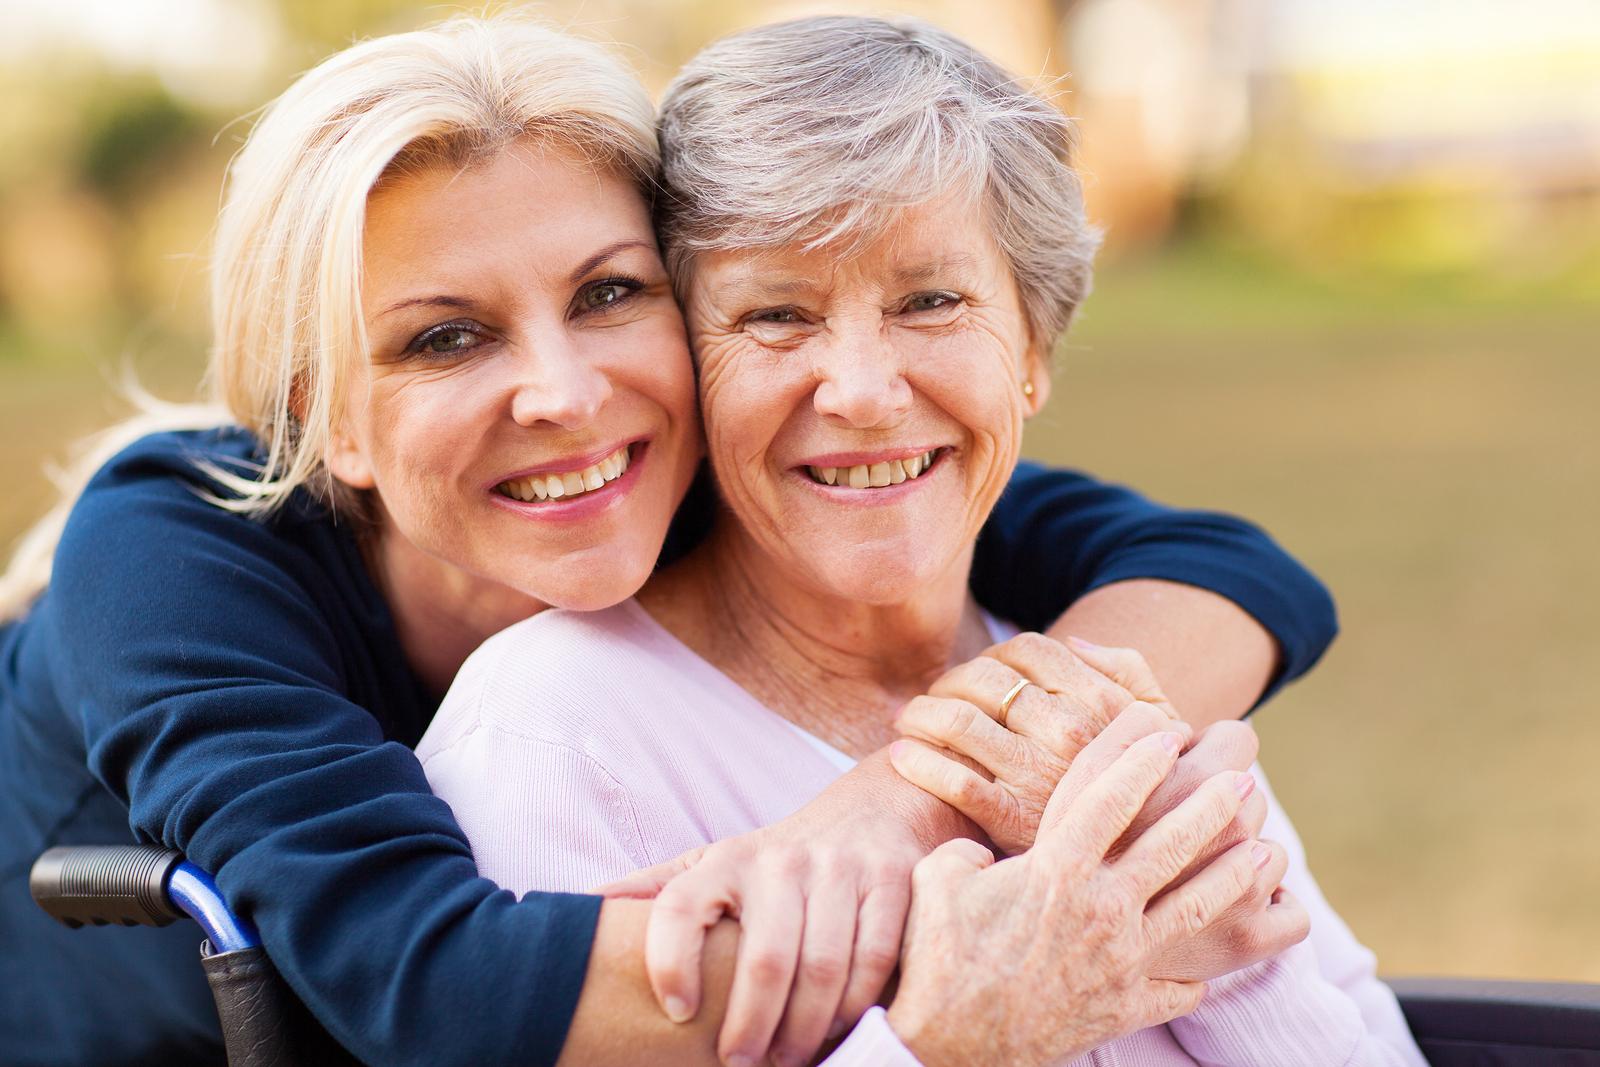 mount gilead mature women personals Meet thousands of beautiful single women online seeking men for dating, love, marriage in ohio.